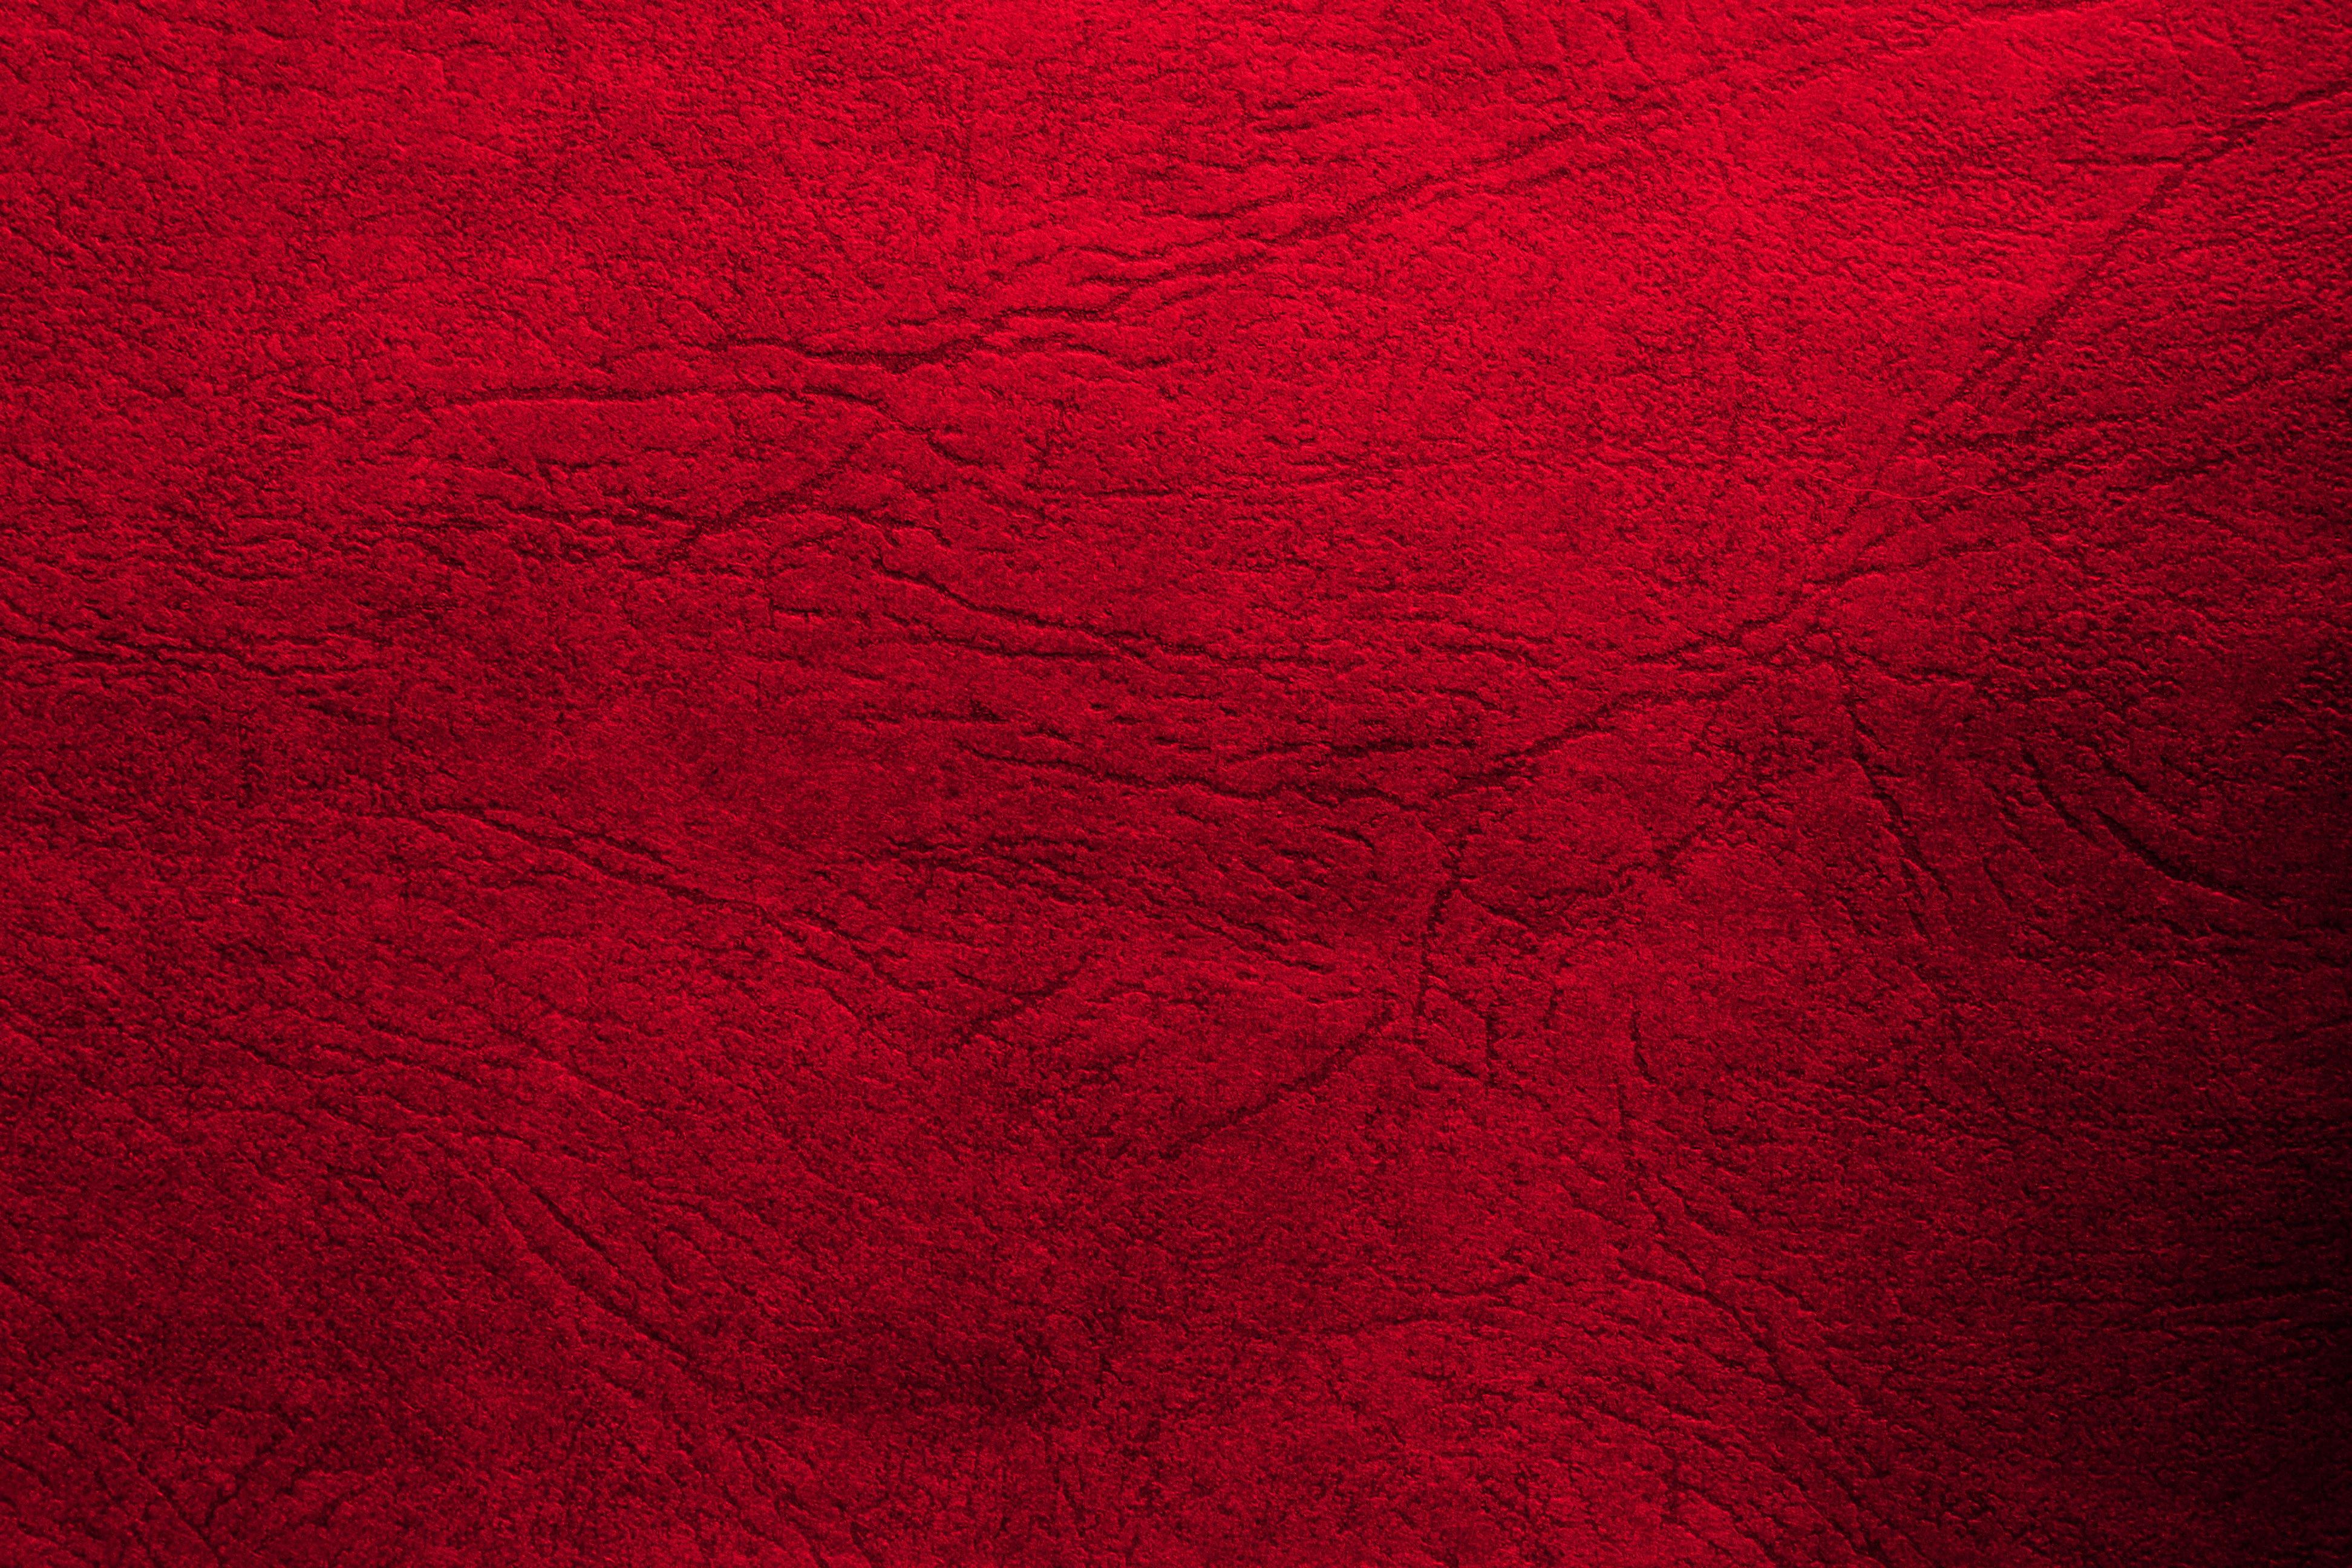 Dark Textures clipart black wool Texture Patterns Red Feel /